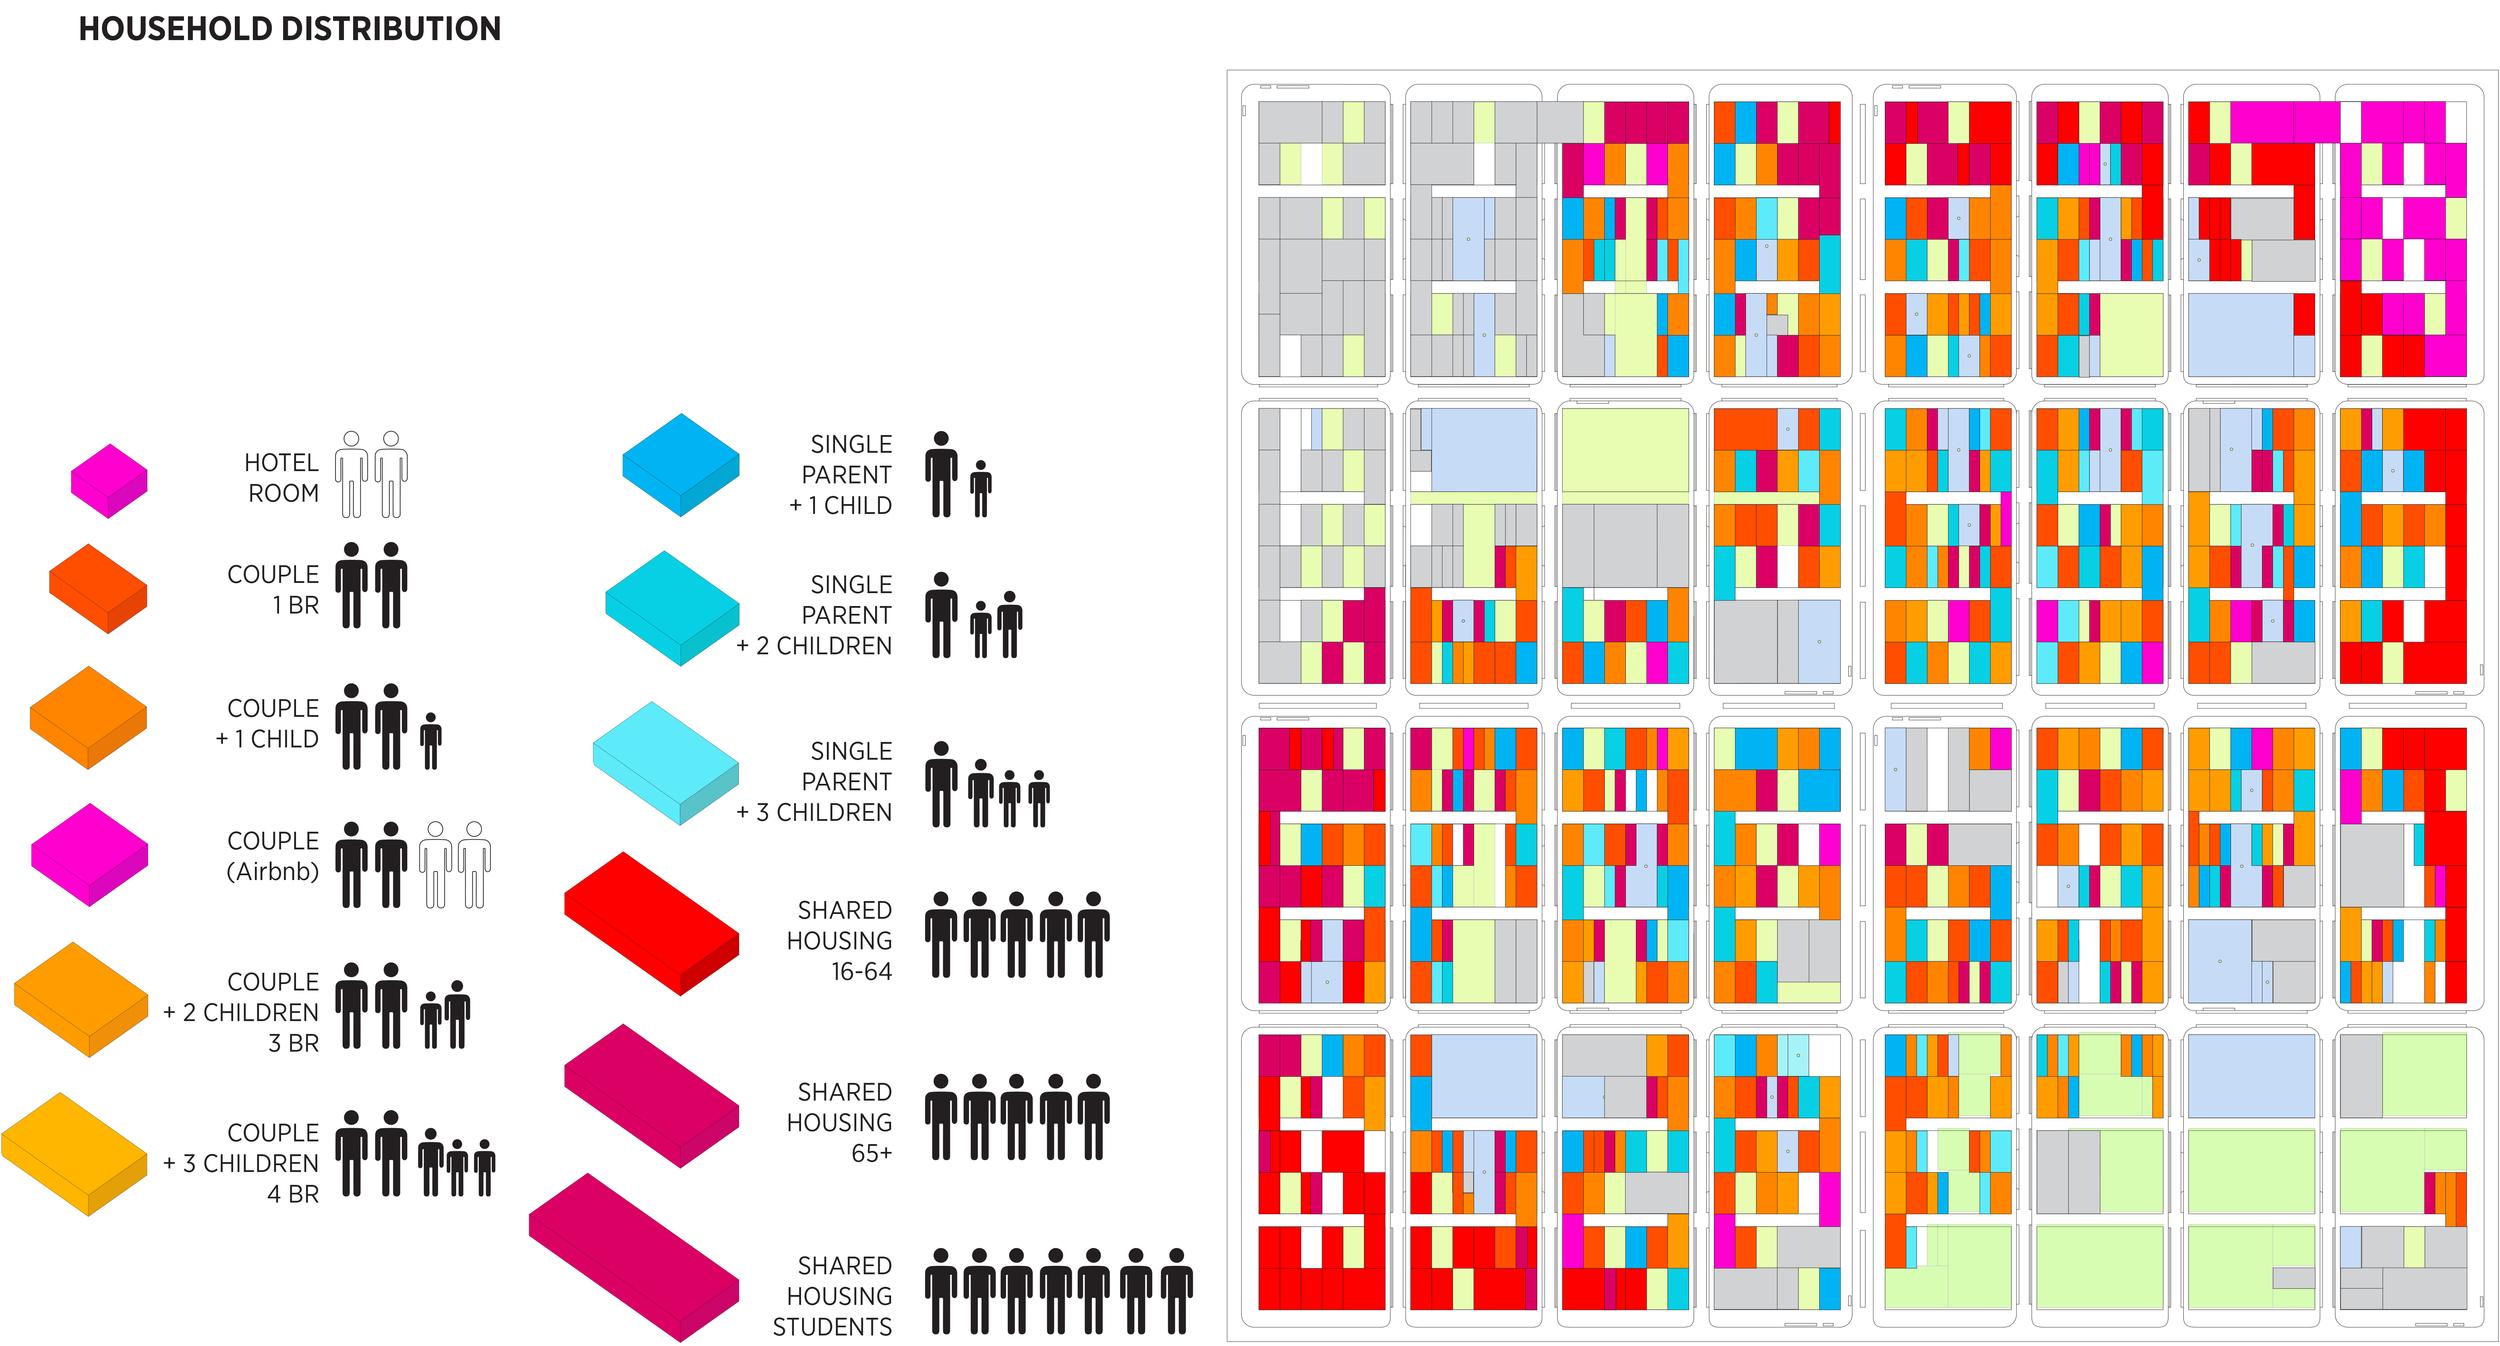 Housing Distribution in Self Sufficient Neighborhood